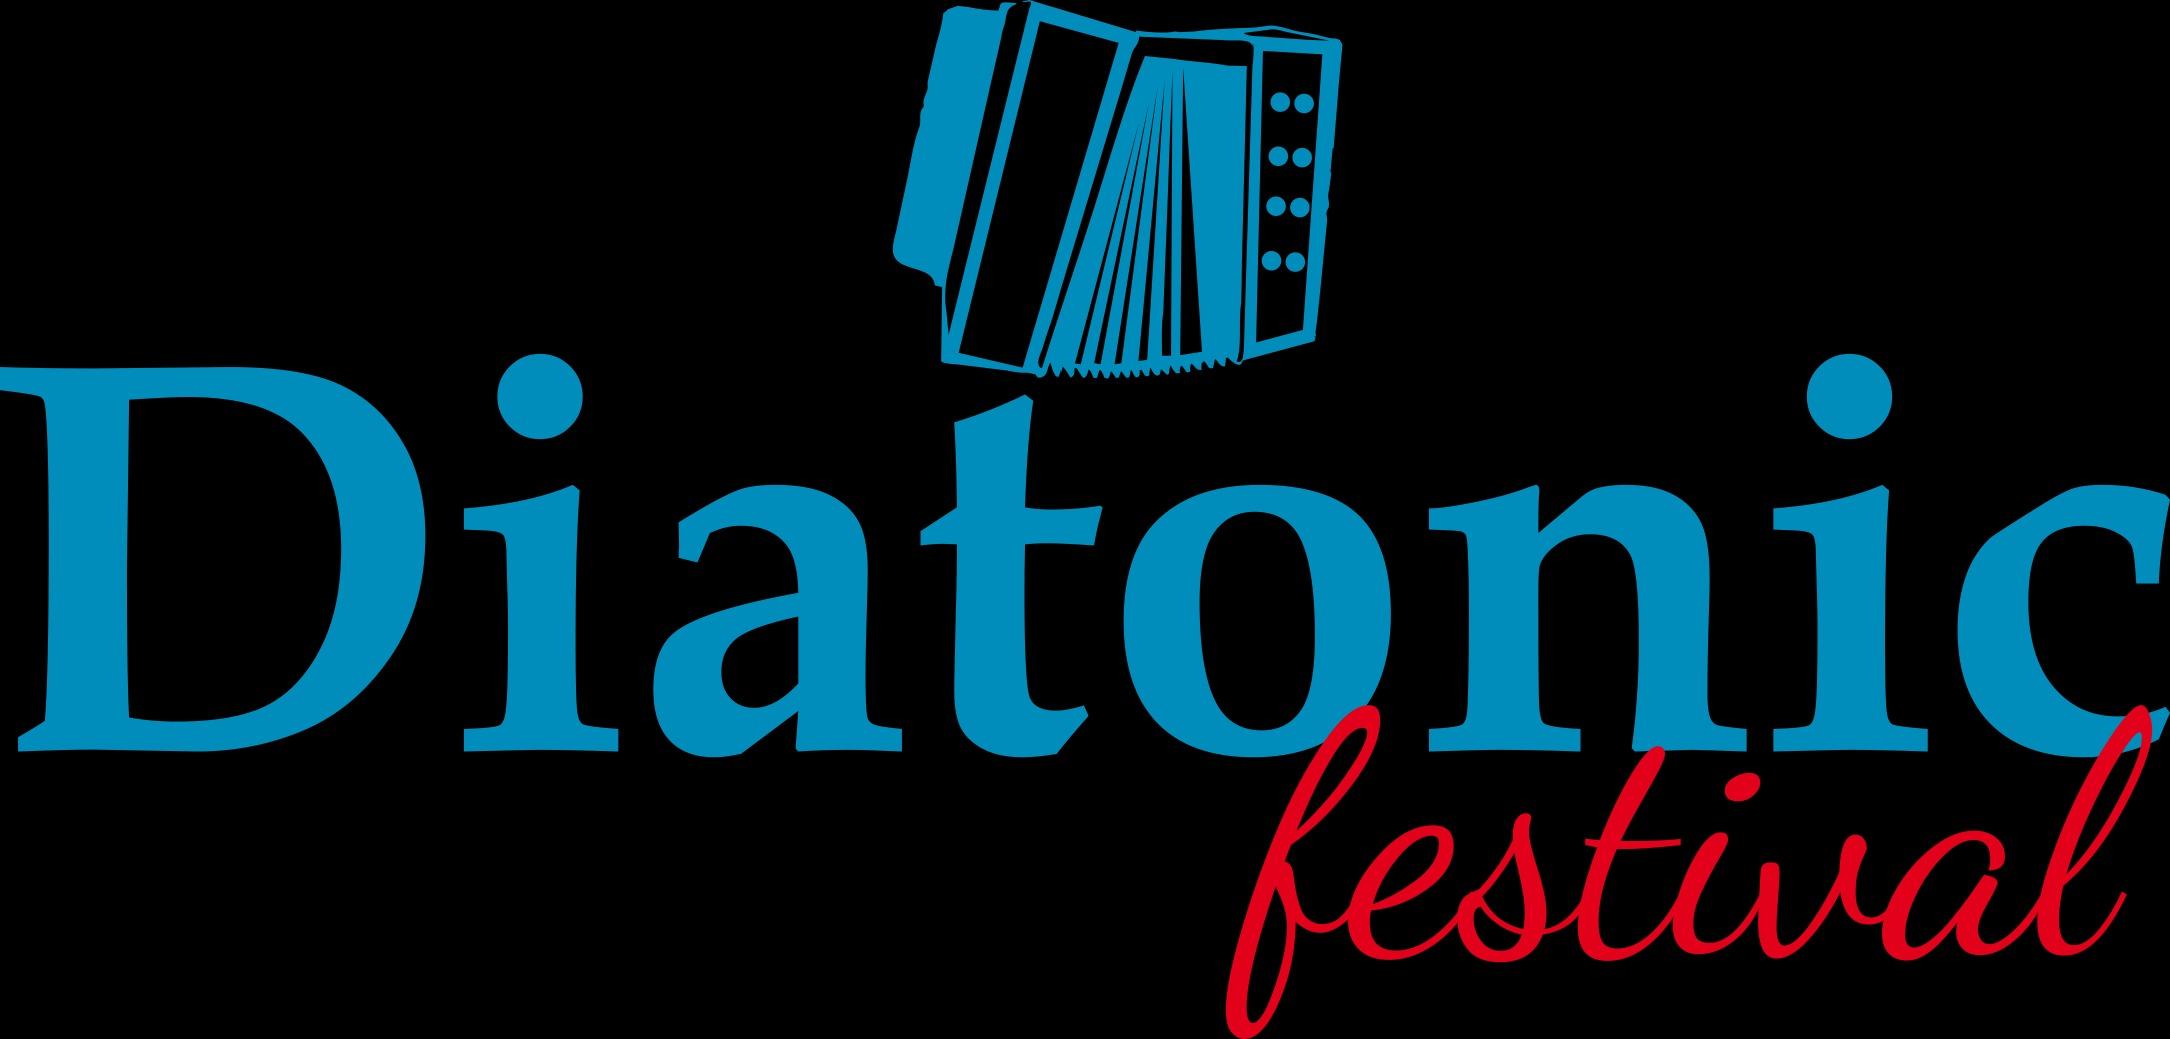 Diatoni festival